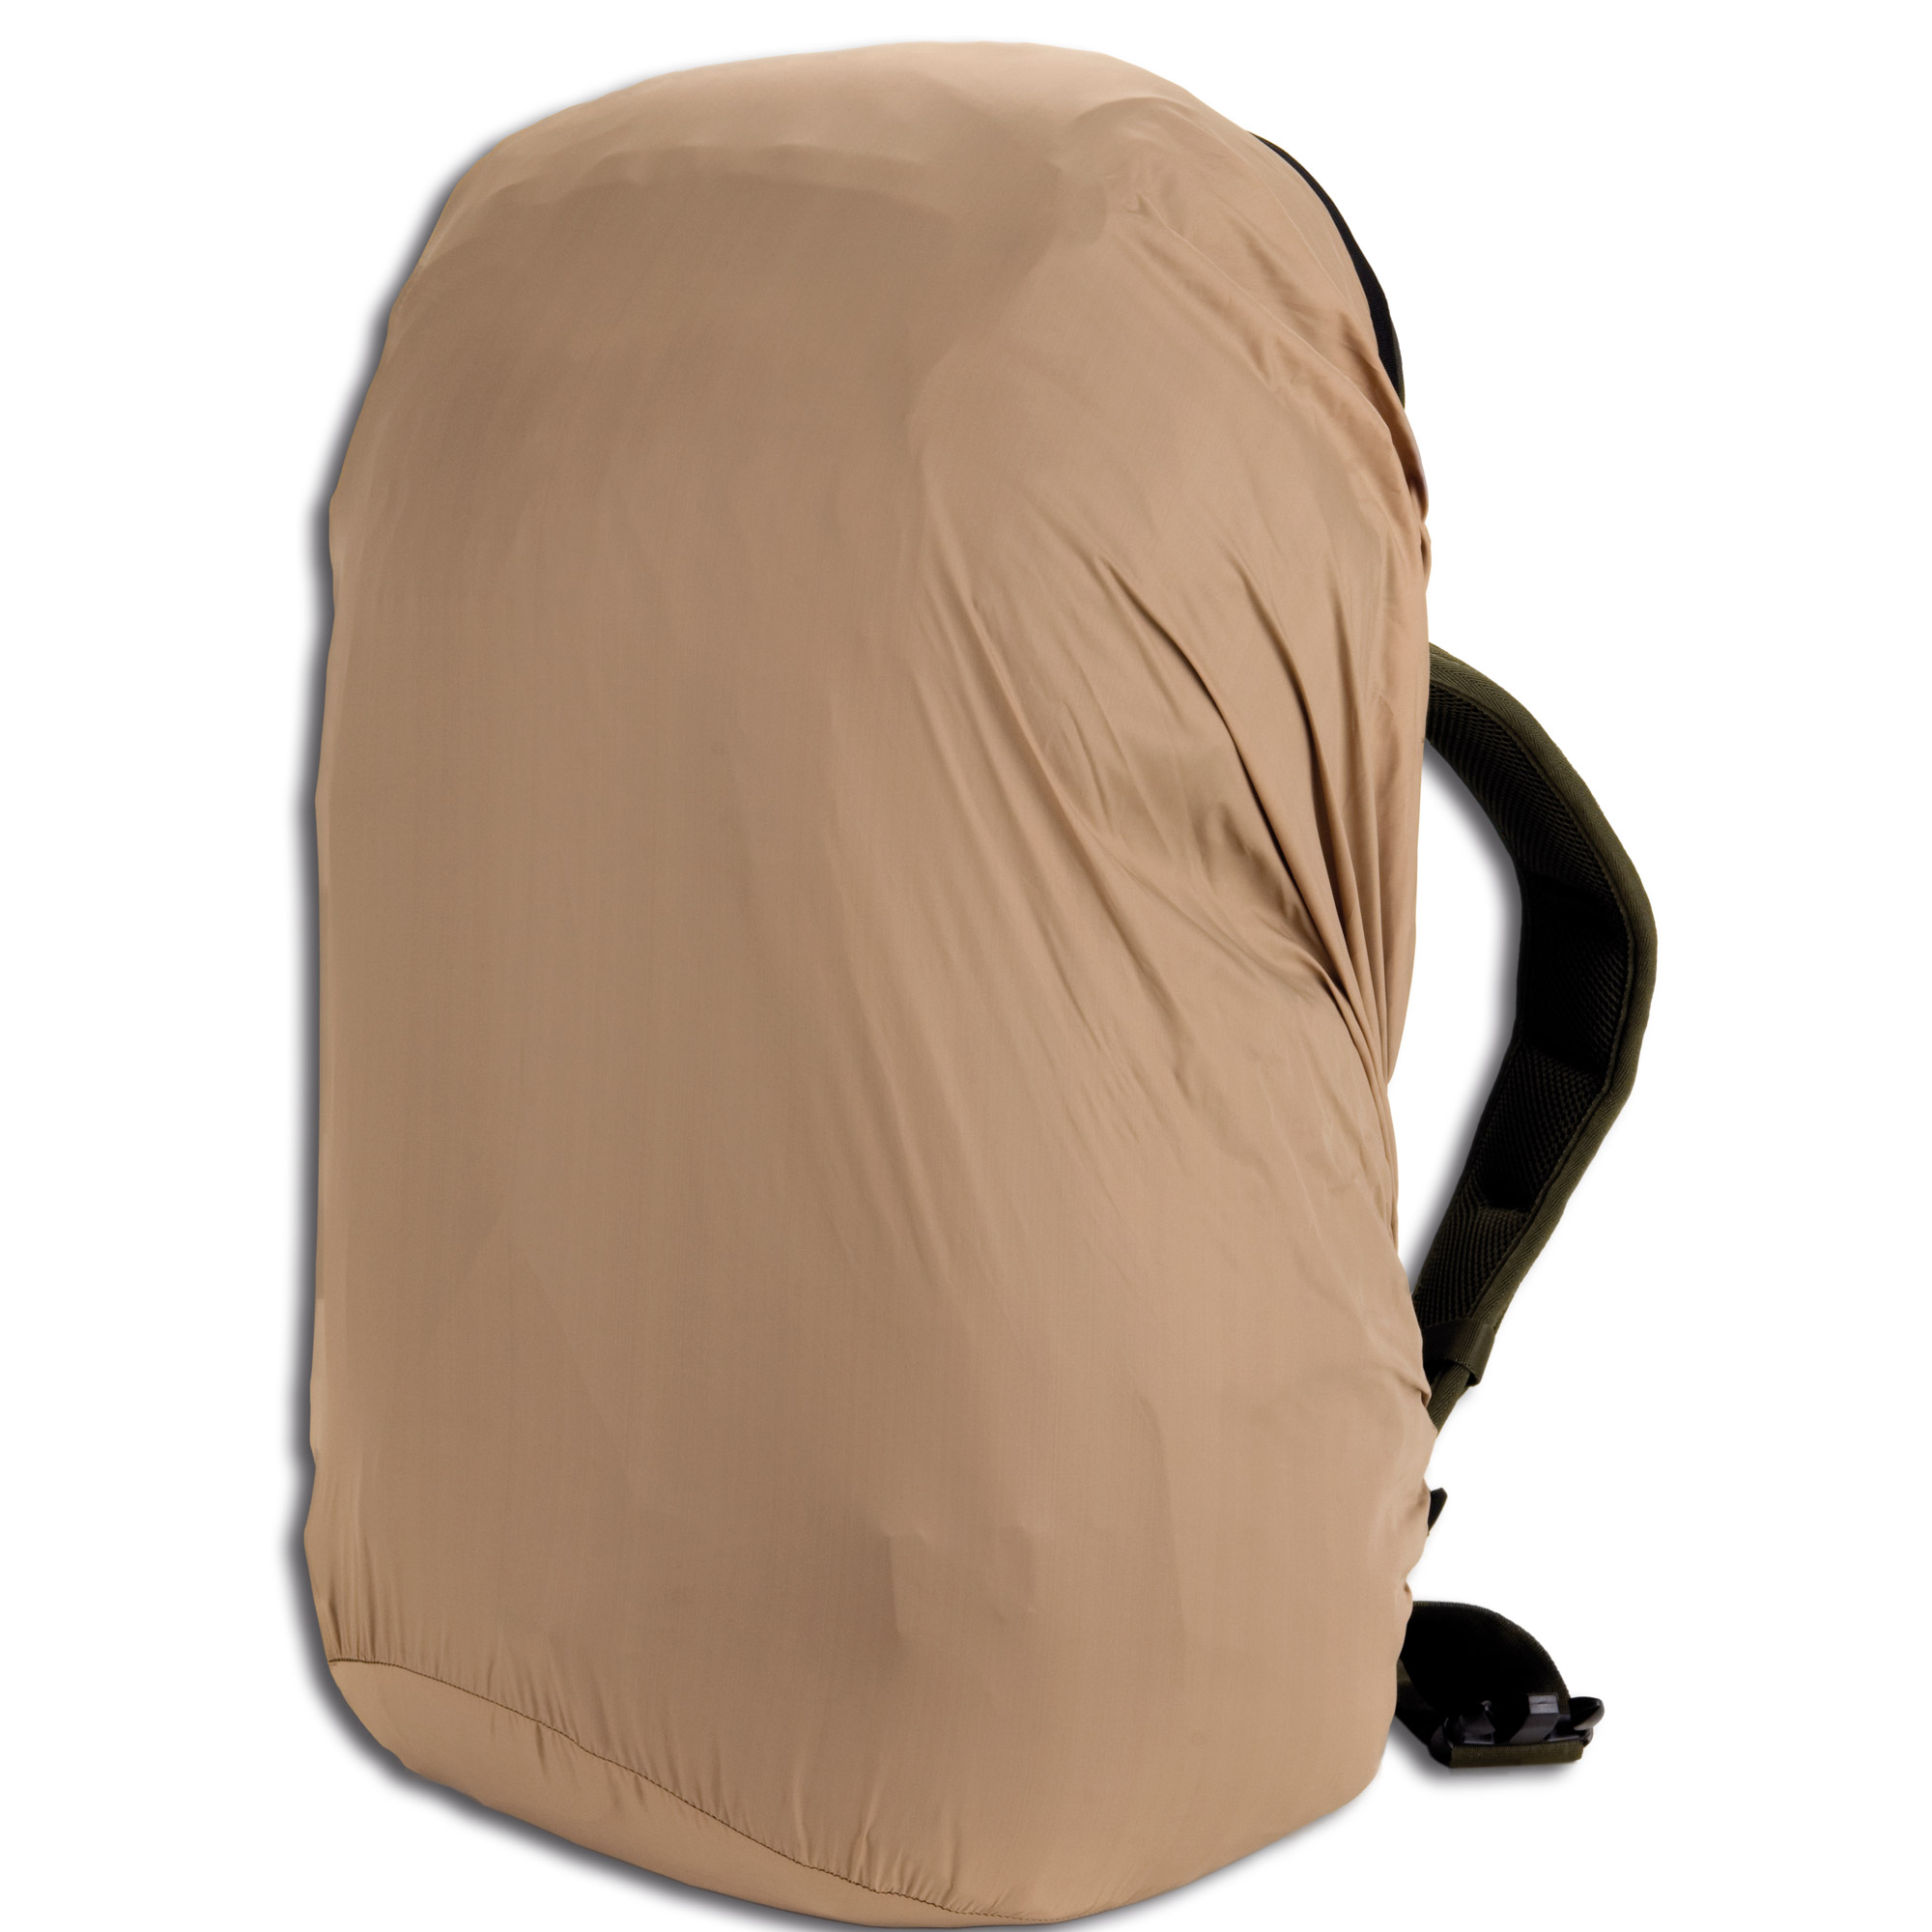 Snugpak Rucksackbezug Aquacover 100 L desert tan